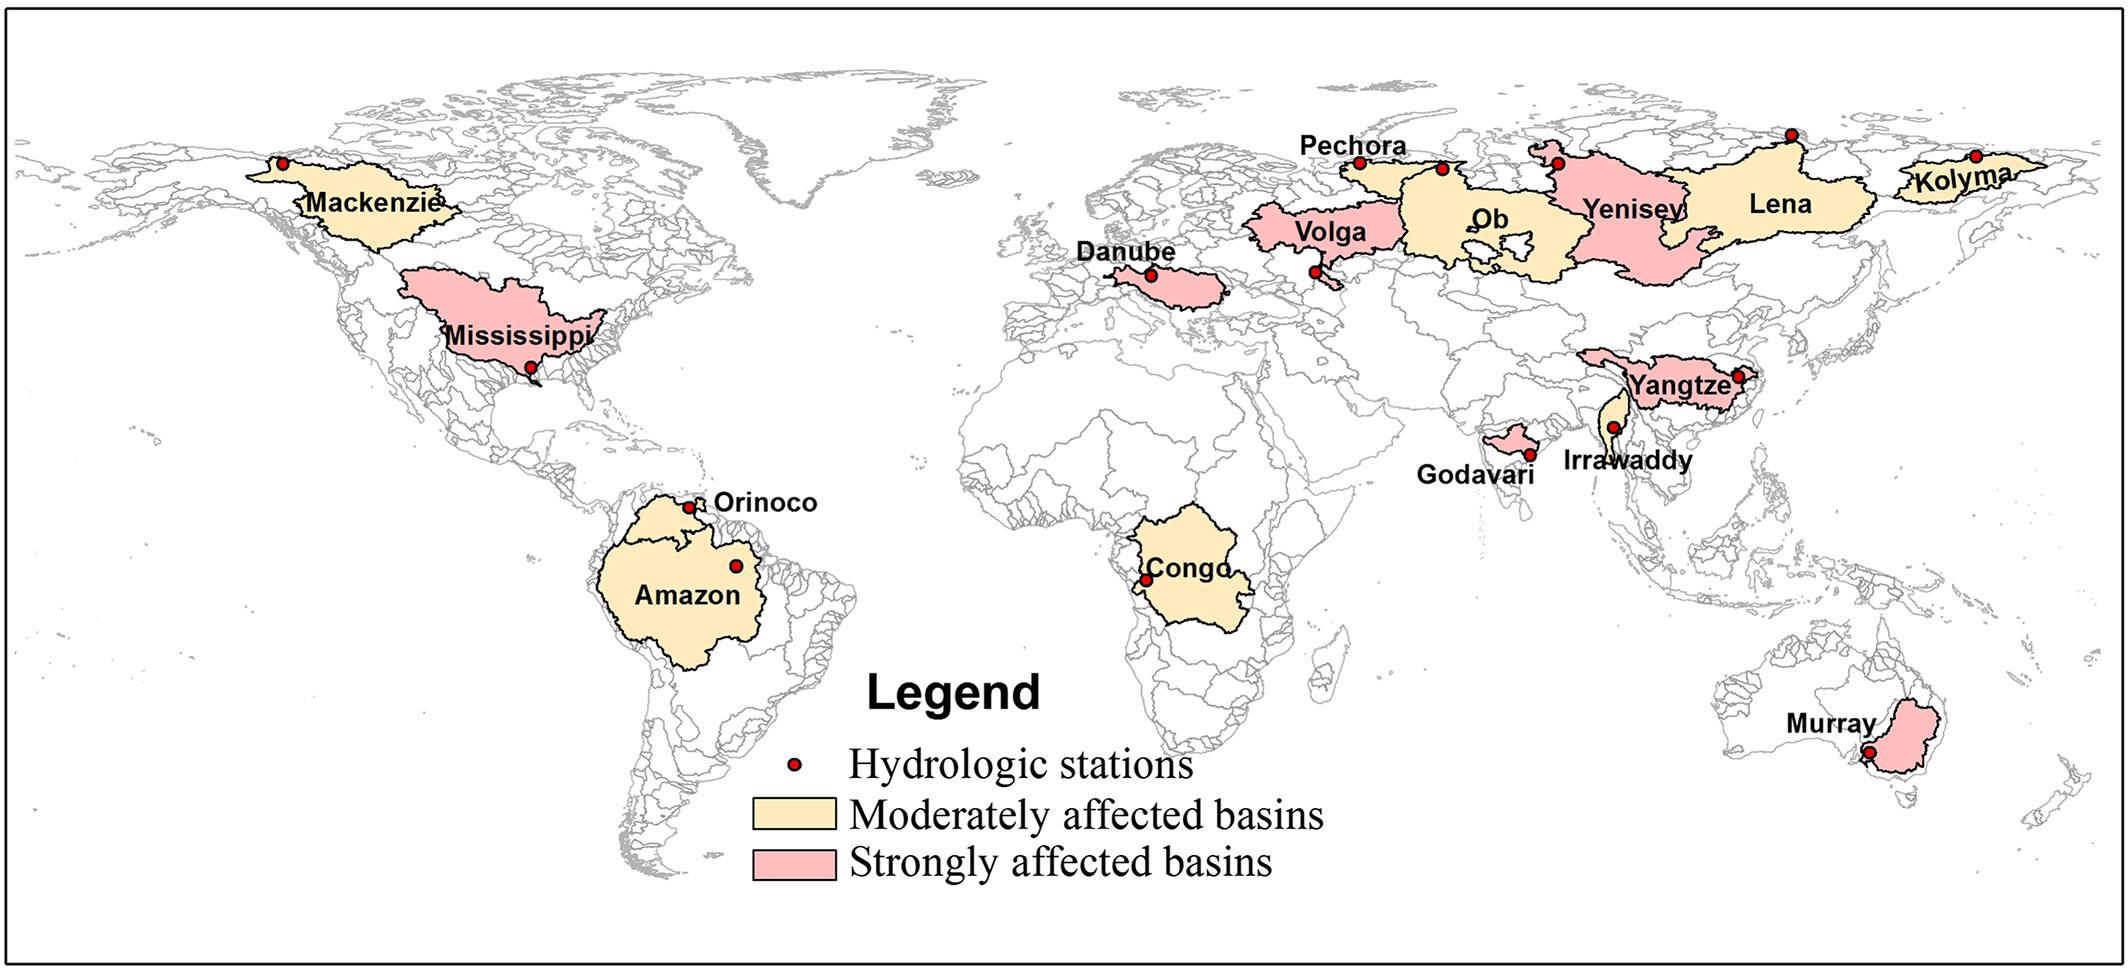 Map of 16 major river basins